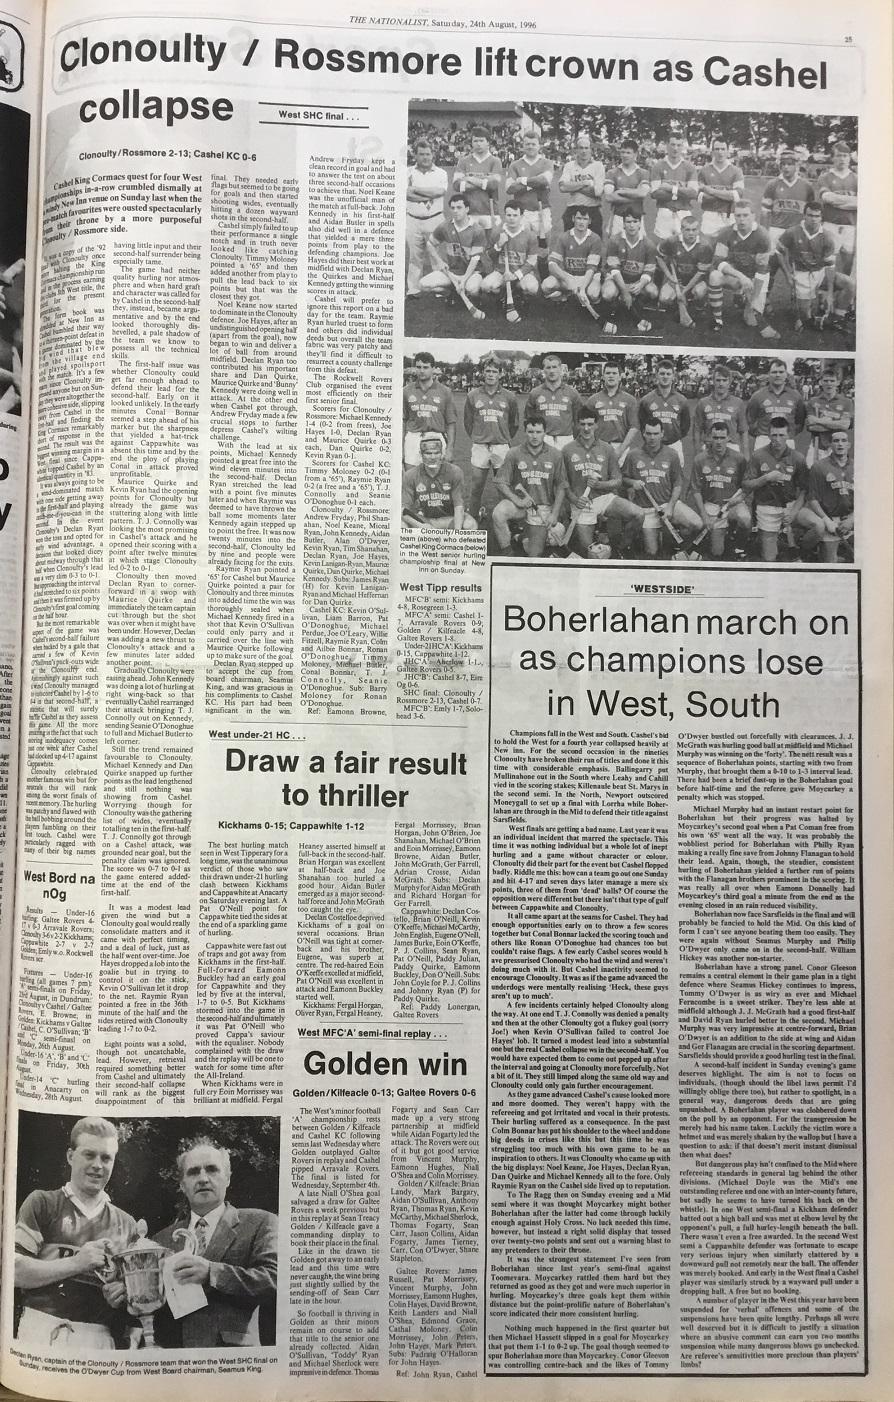 1996 West hurling final